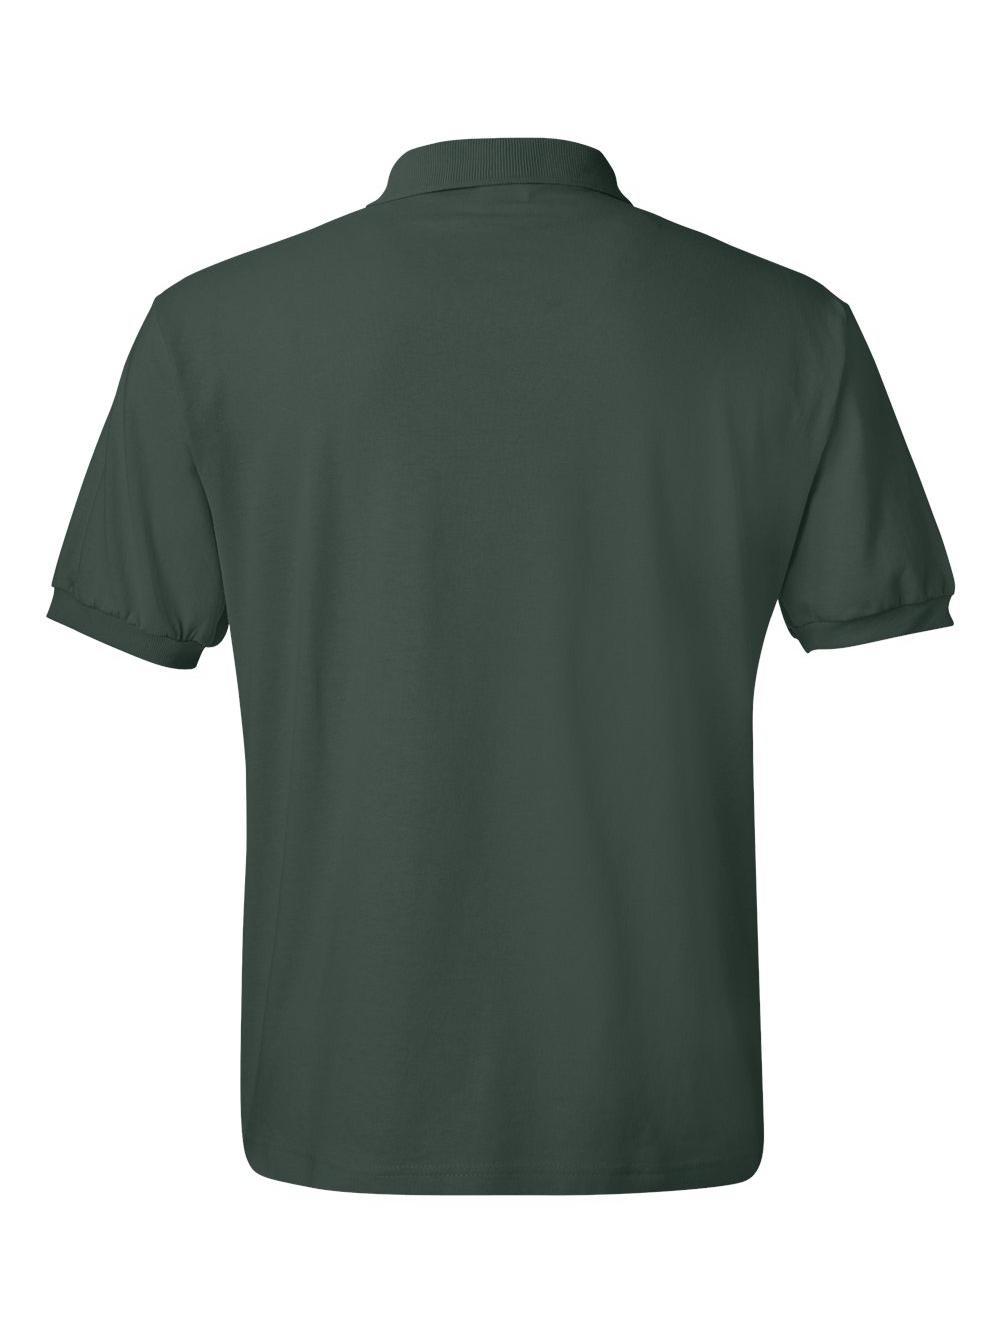 Hanes-Ecosmart-Jersey-Sport-Shirt-054X thumbnail 13